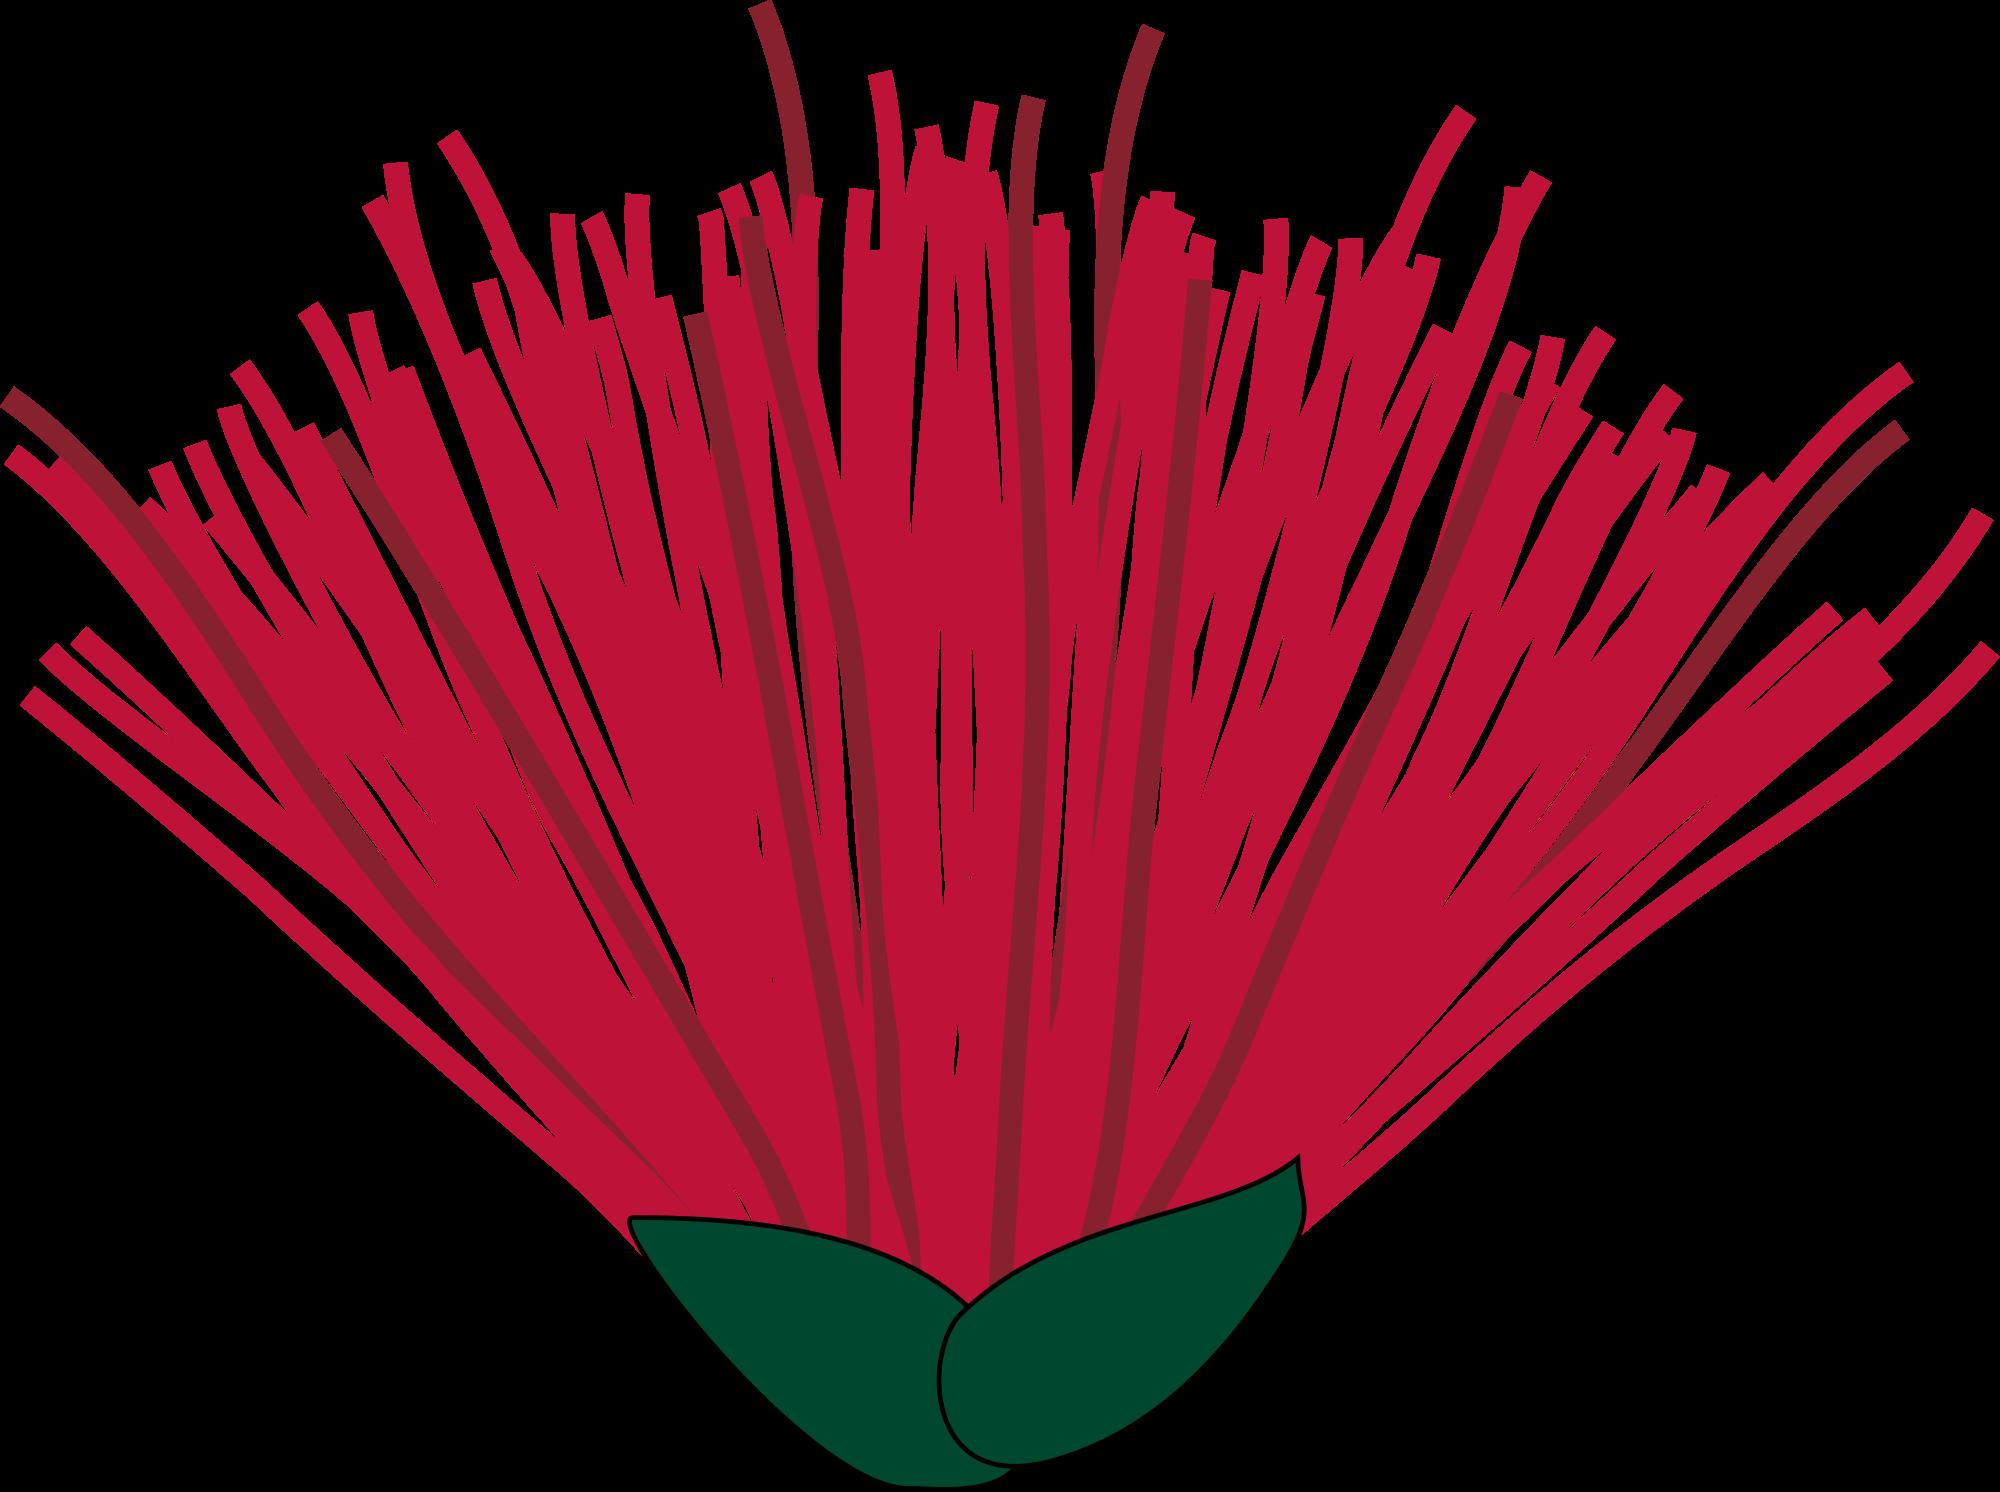 File:Pohutukawa flower.svg.